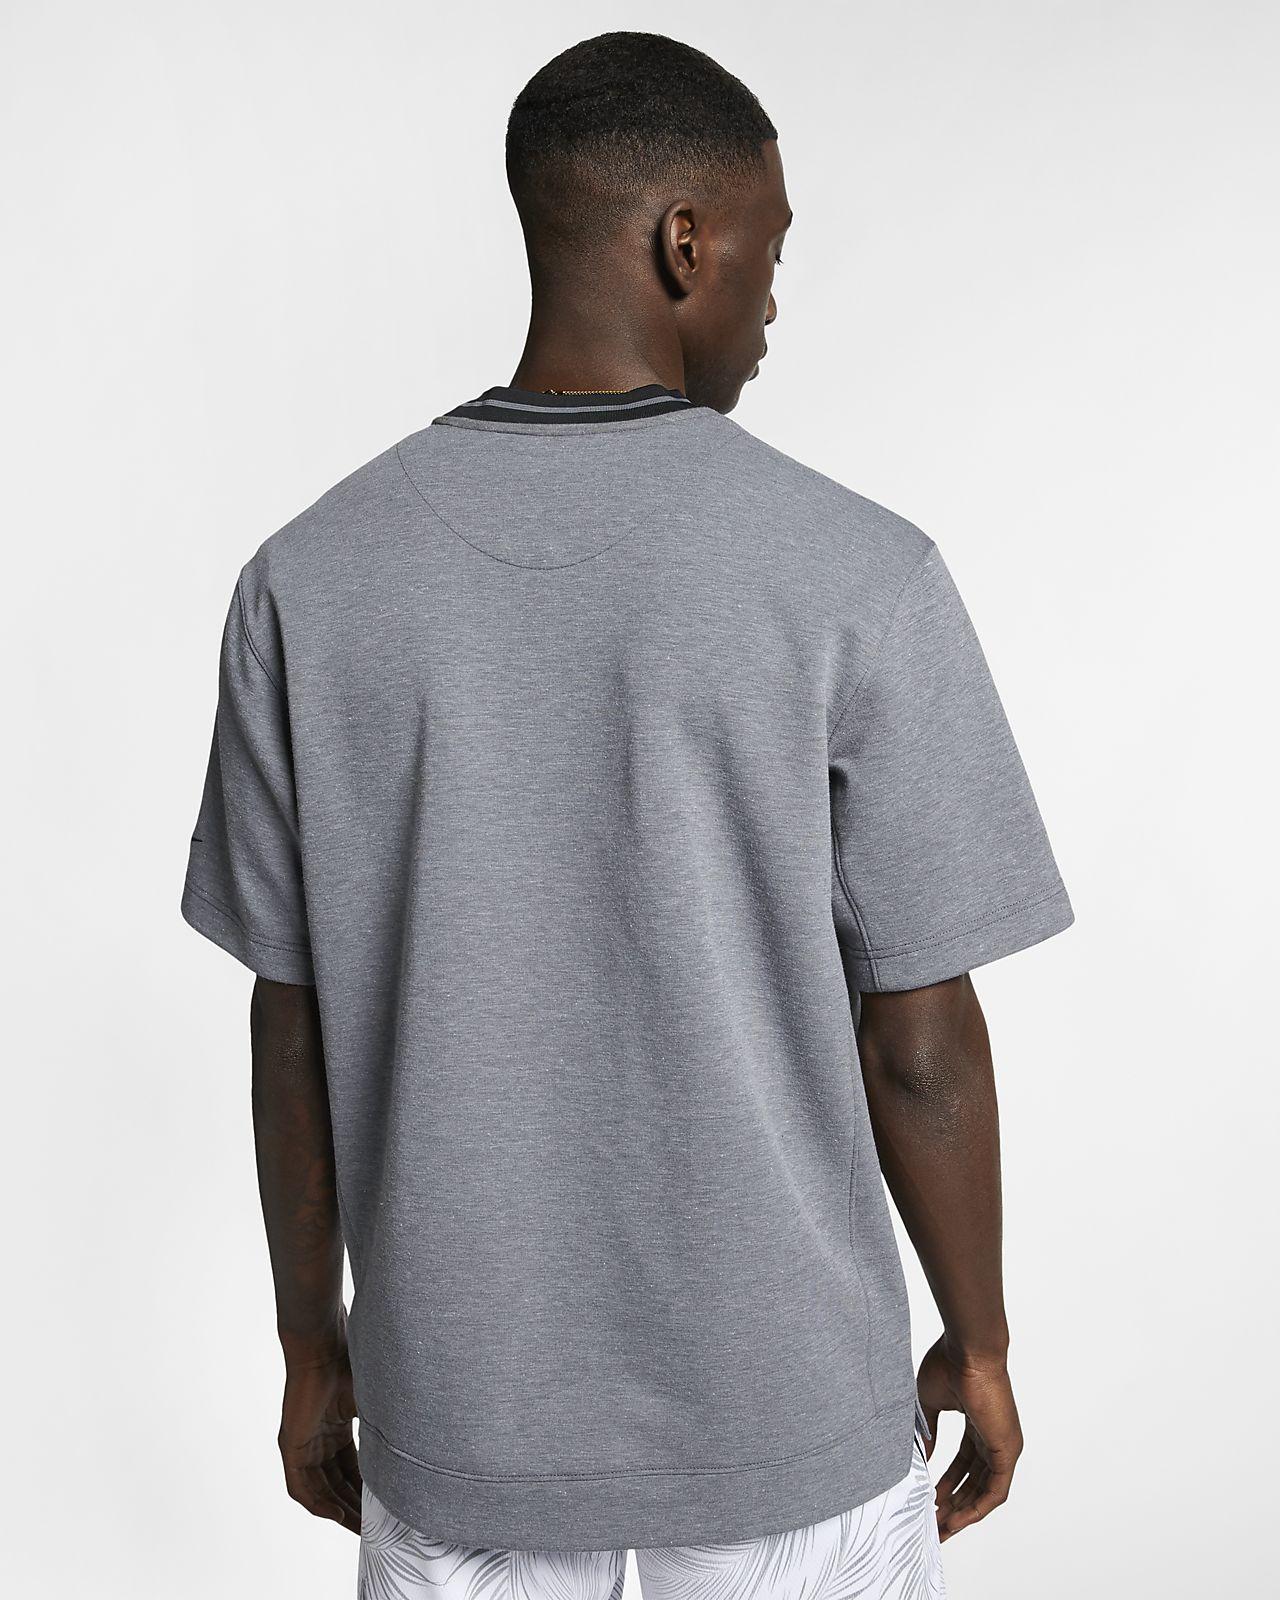 c56c2aee16c48 Nike Dri-FIT Men's Short-Sleeve Basketball Top. Nike.com